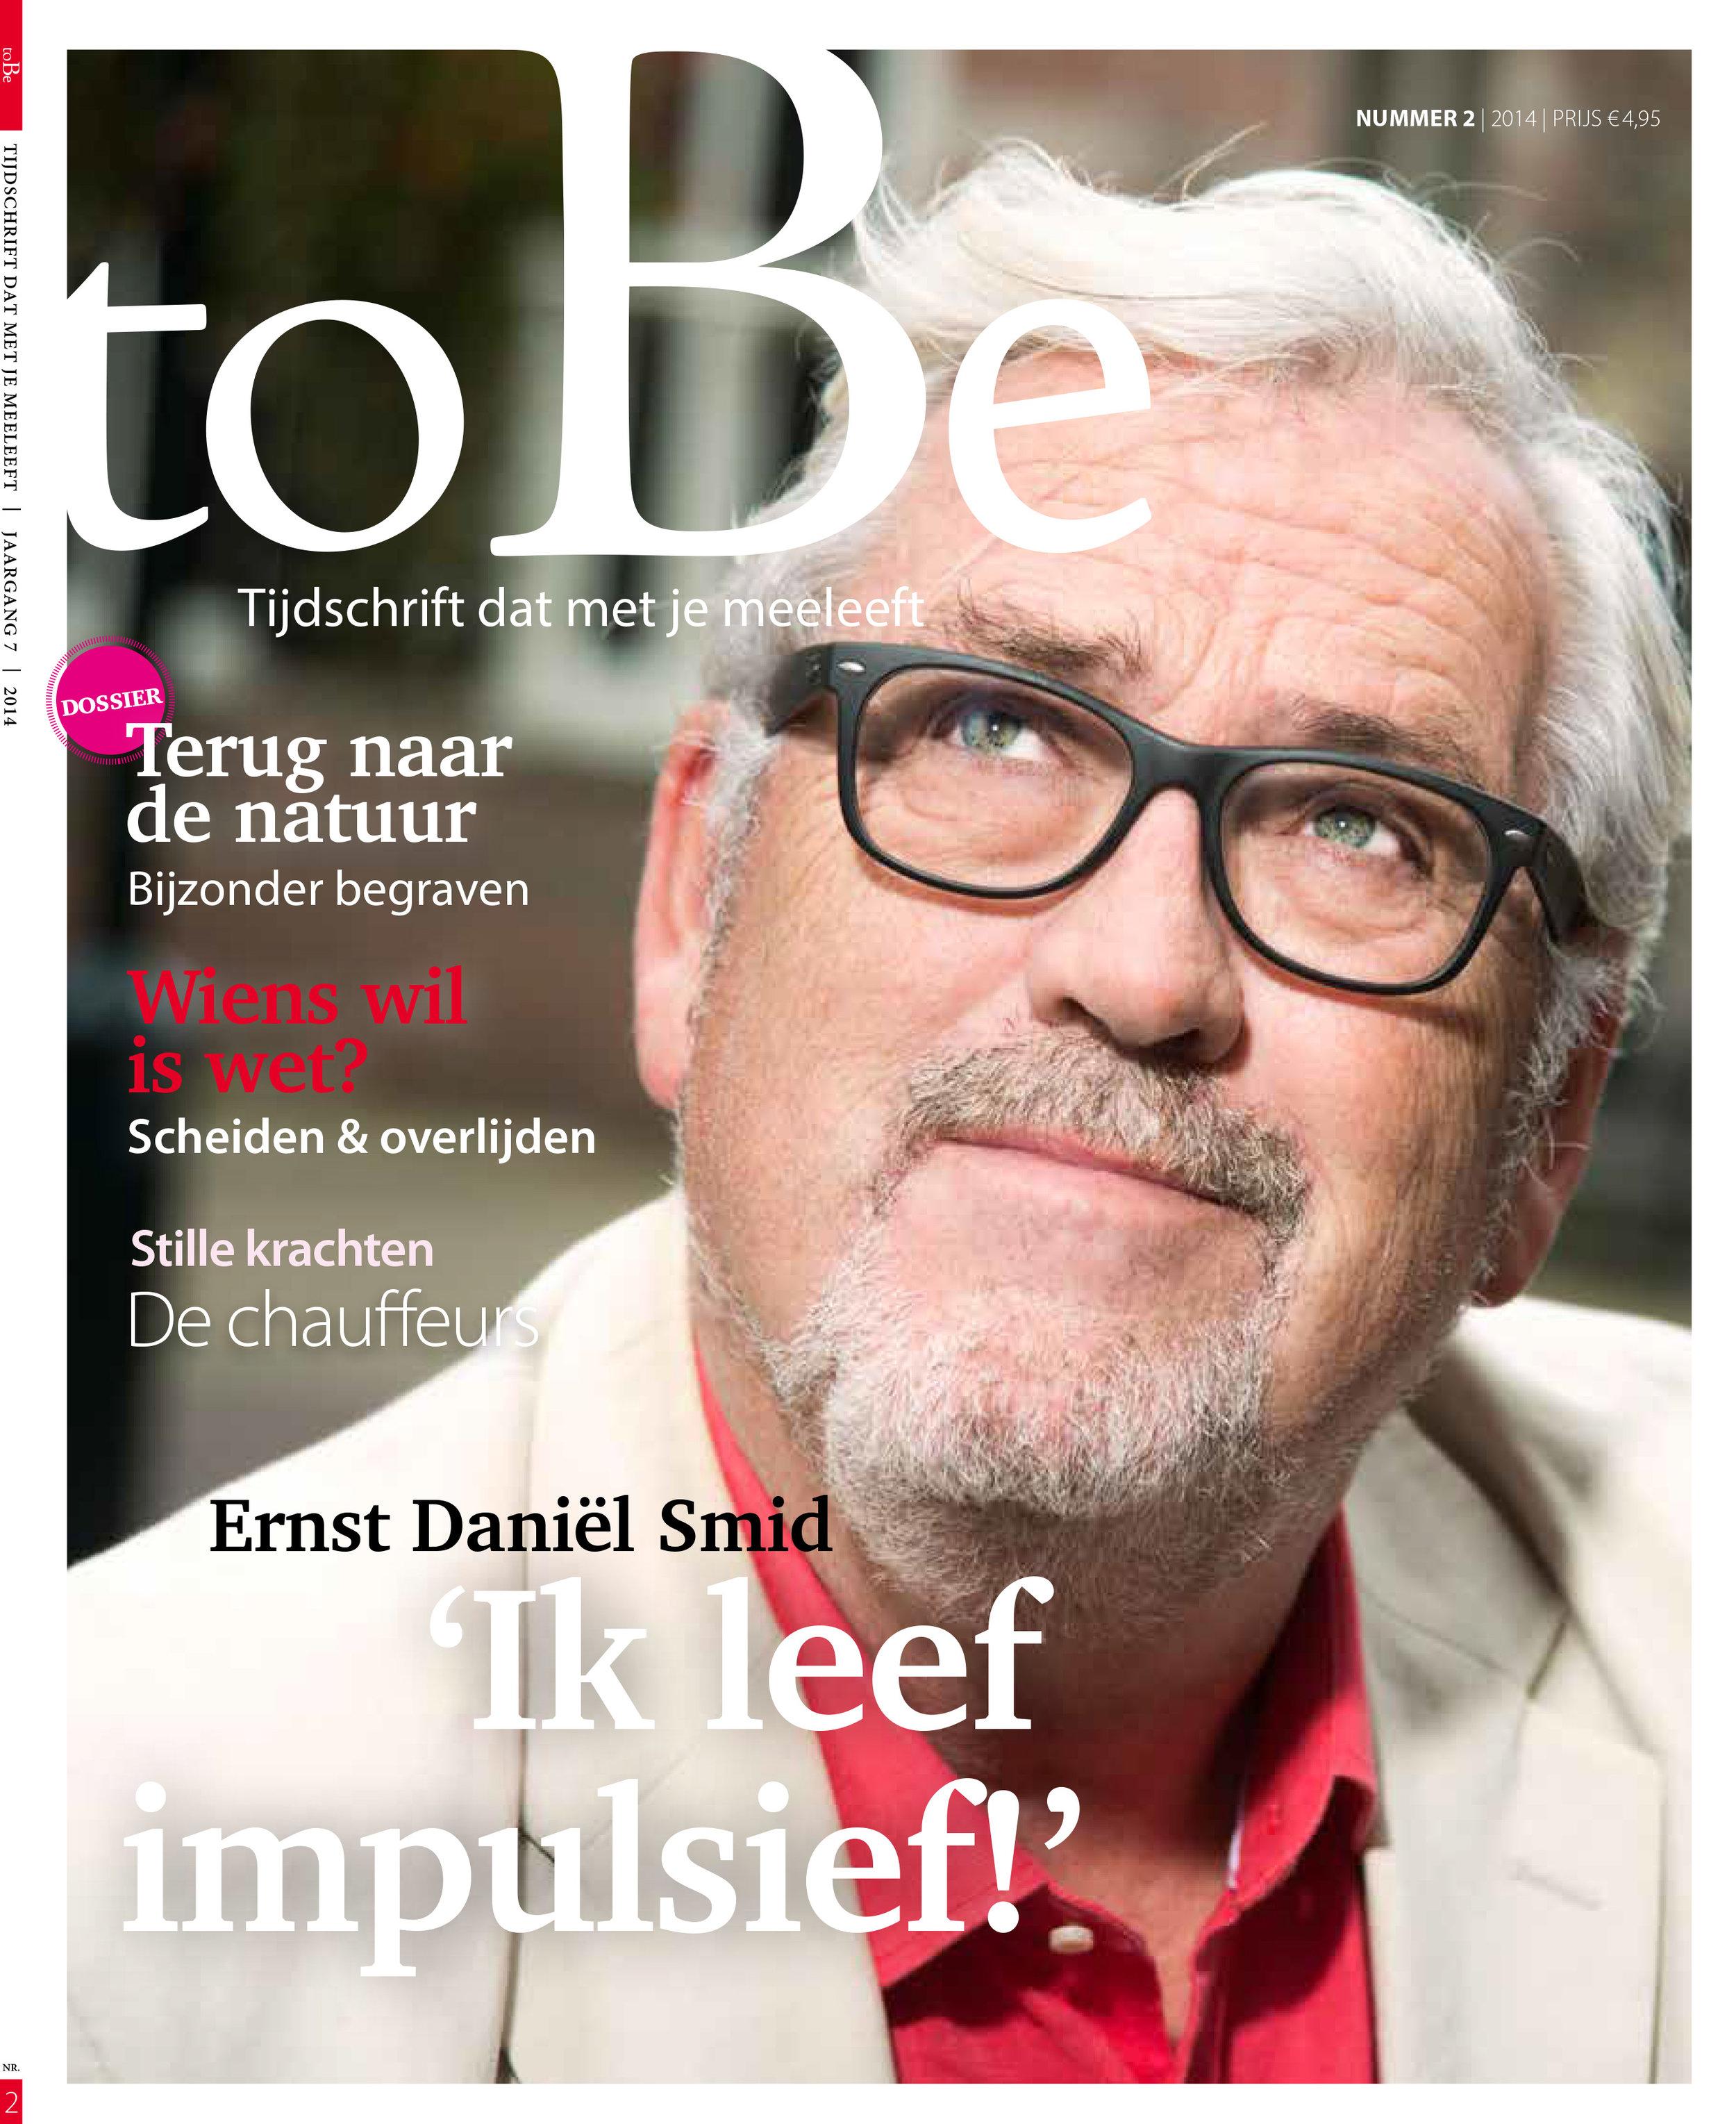 Ernst Daniel Smidt